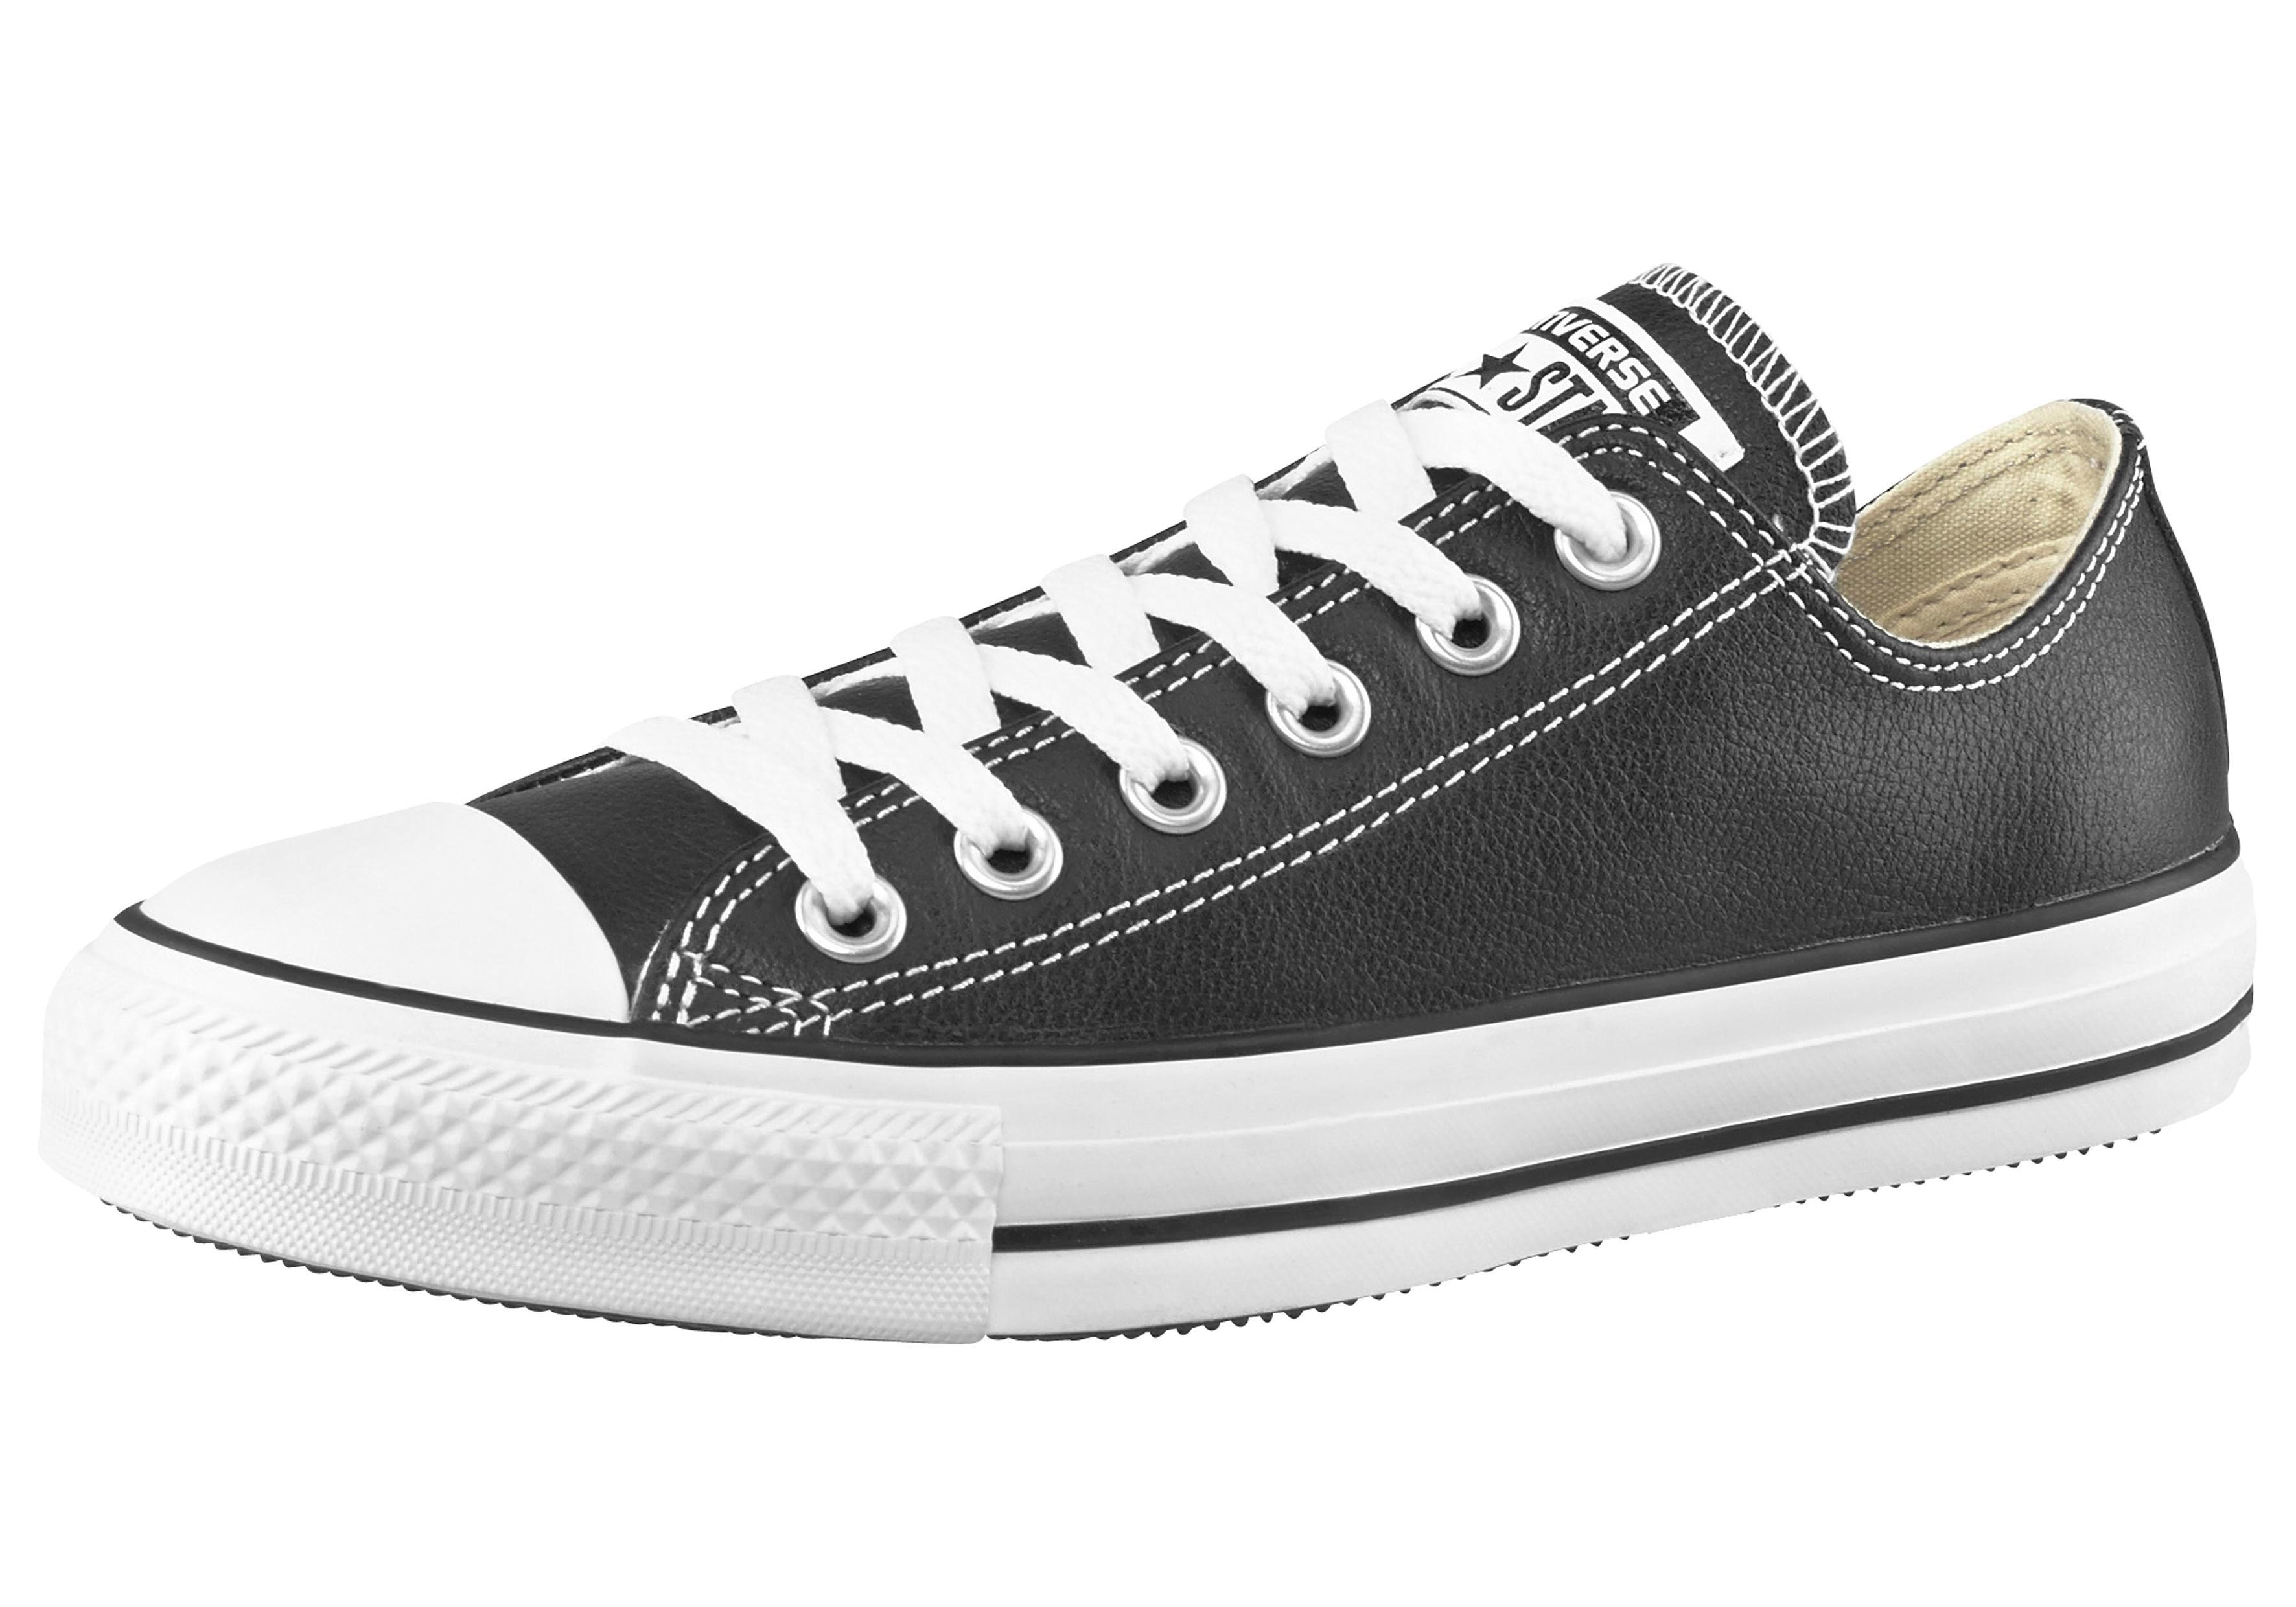 Converse Sneakers Chuck Taylor All Star Basic Leather Ox - verschillende betaalmethodes